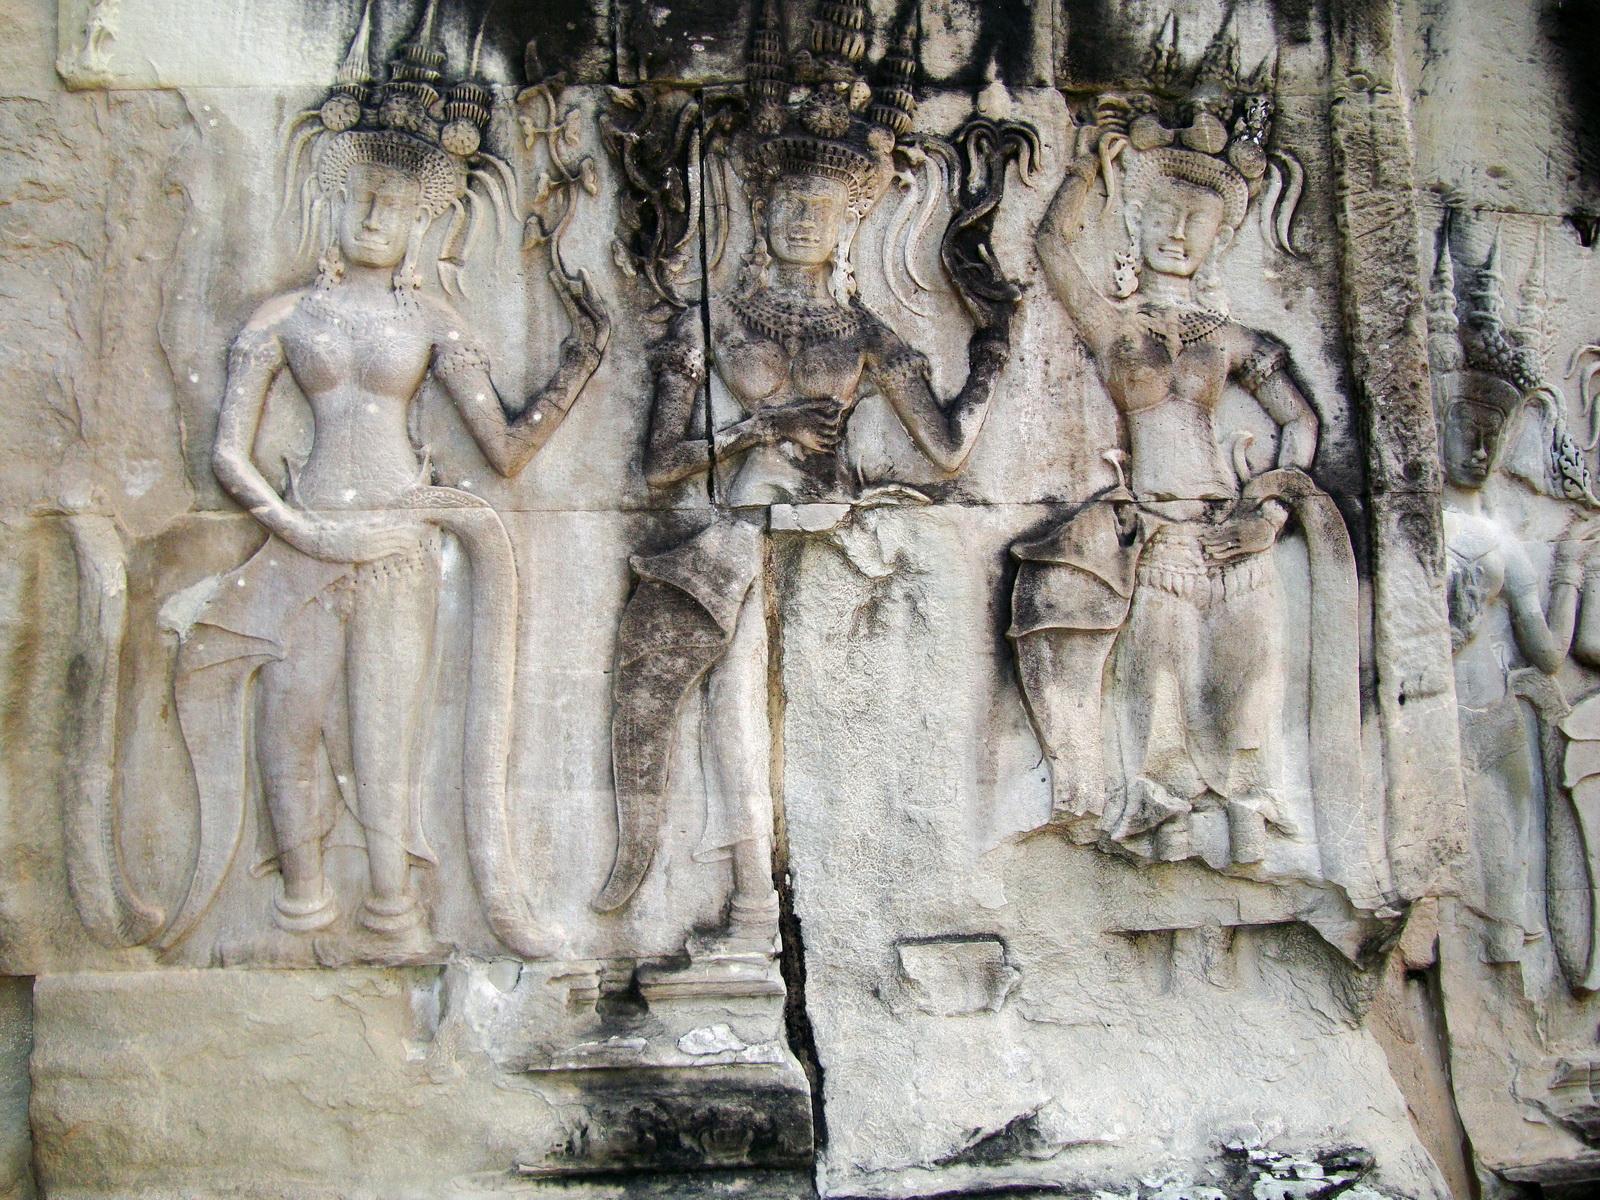 Angkor Wat Khmer architecture bas relief devatas Siem Reap 16